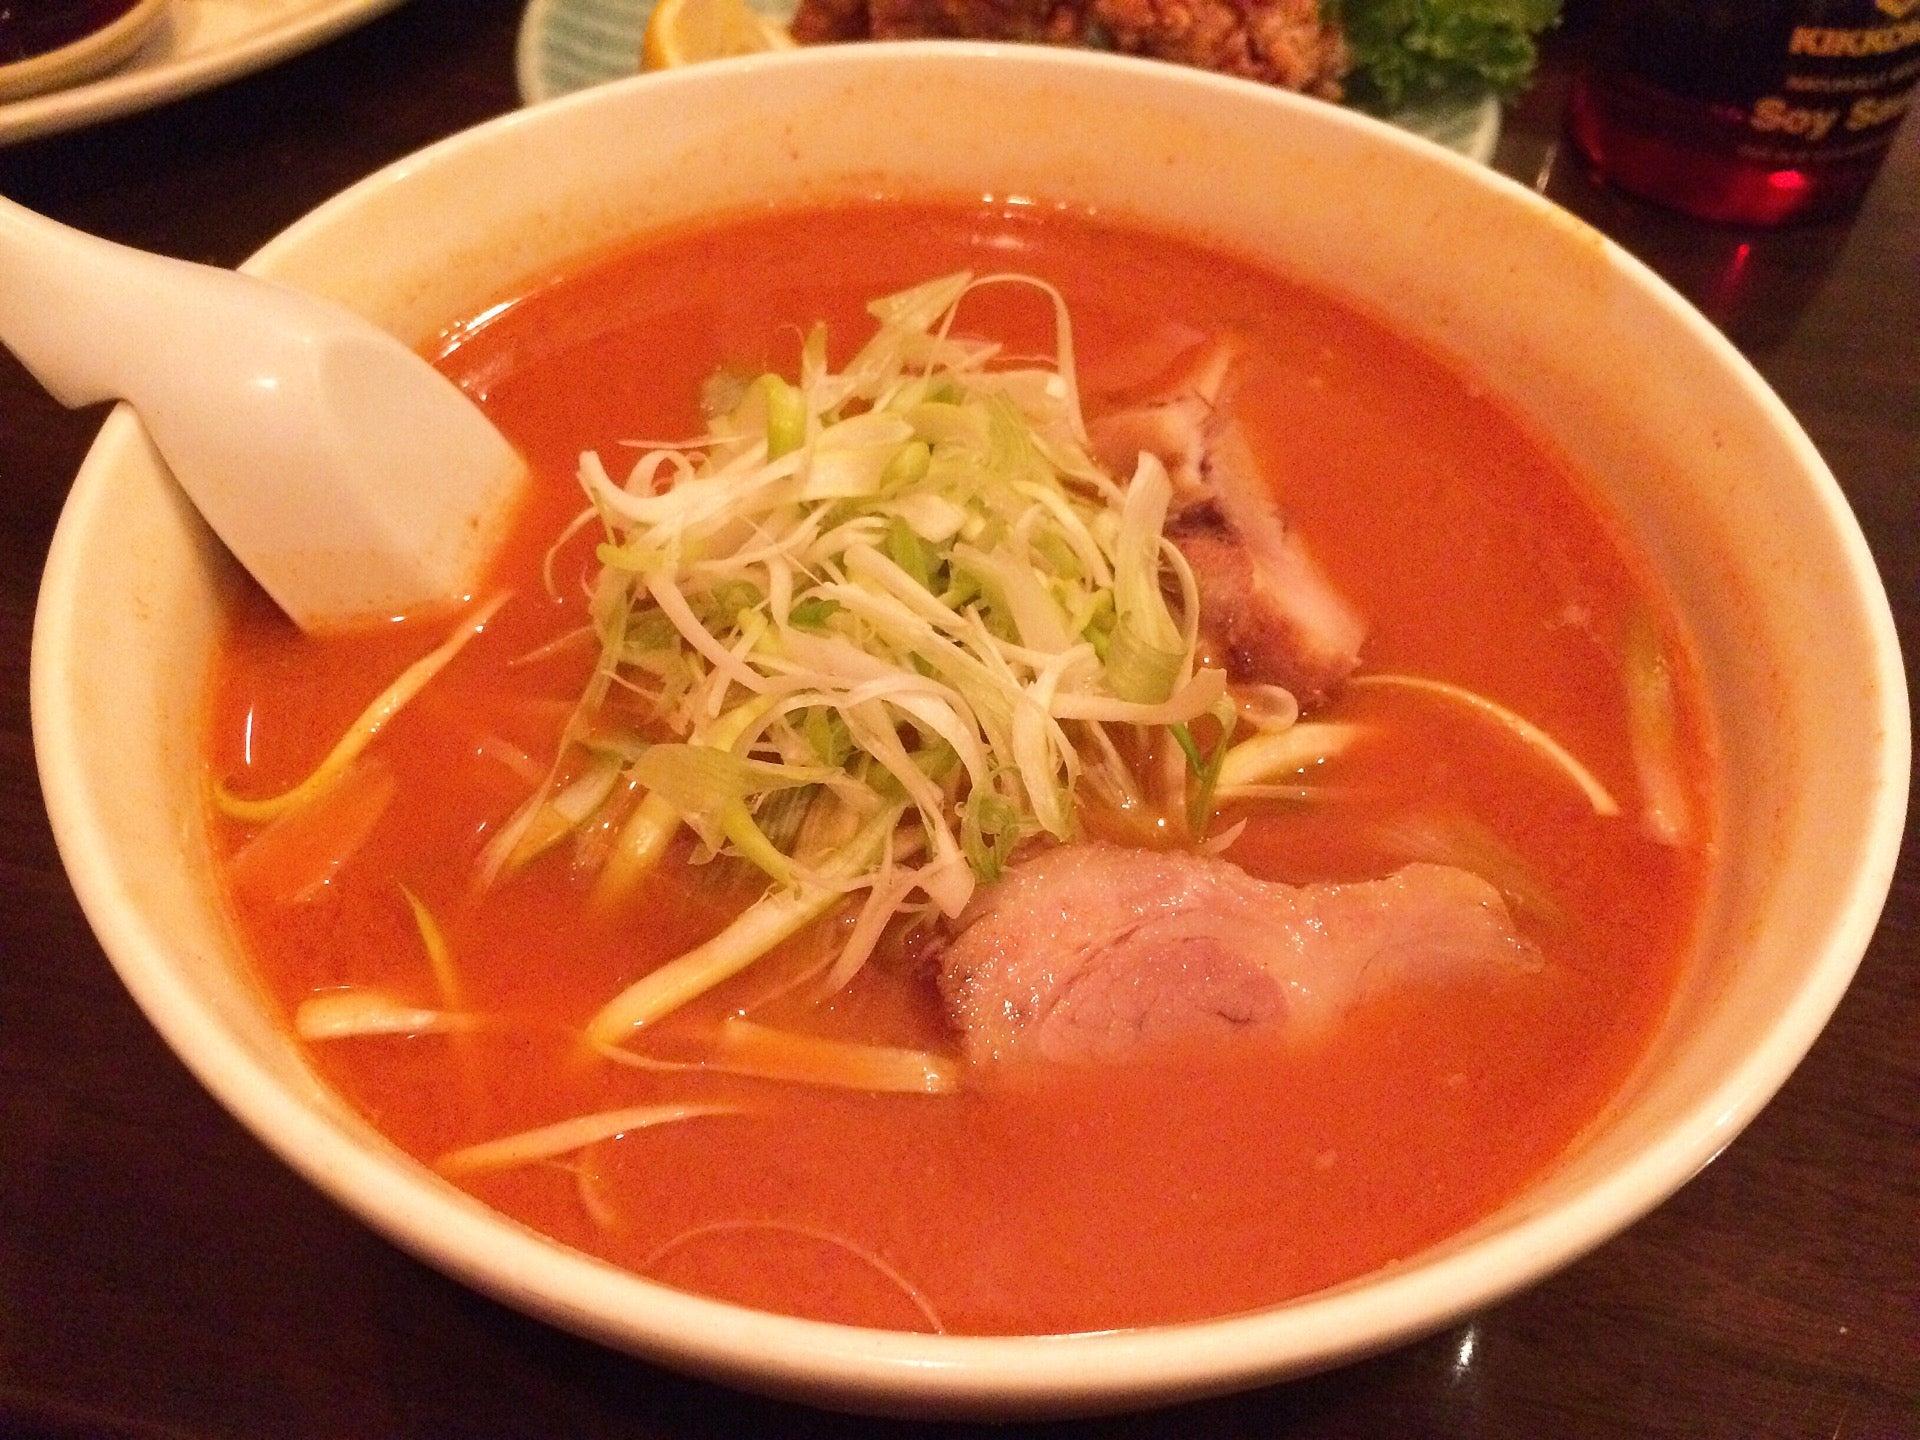 ISE JAPANESE RESTAURANT,gyoza,japanese restaurant,japanese, ramen, noodles,onigiri,ramen,sushi